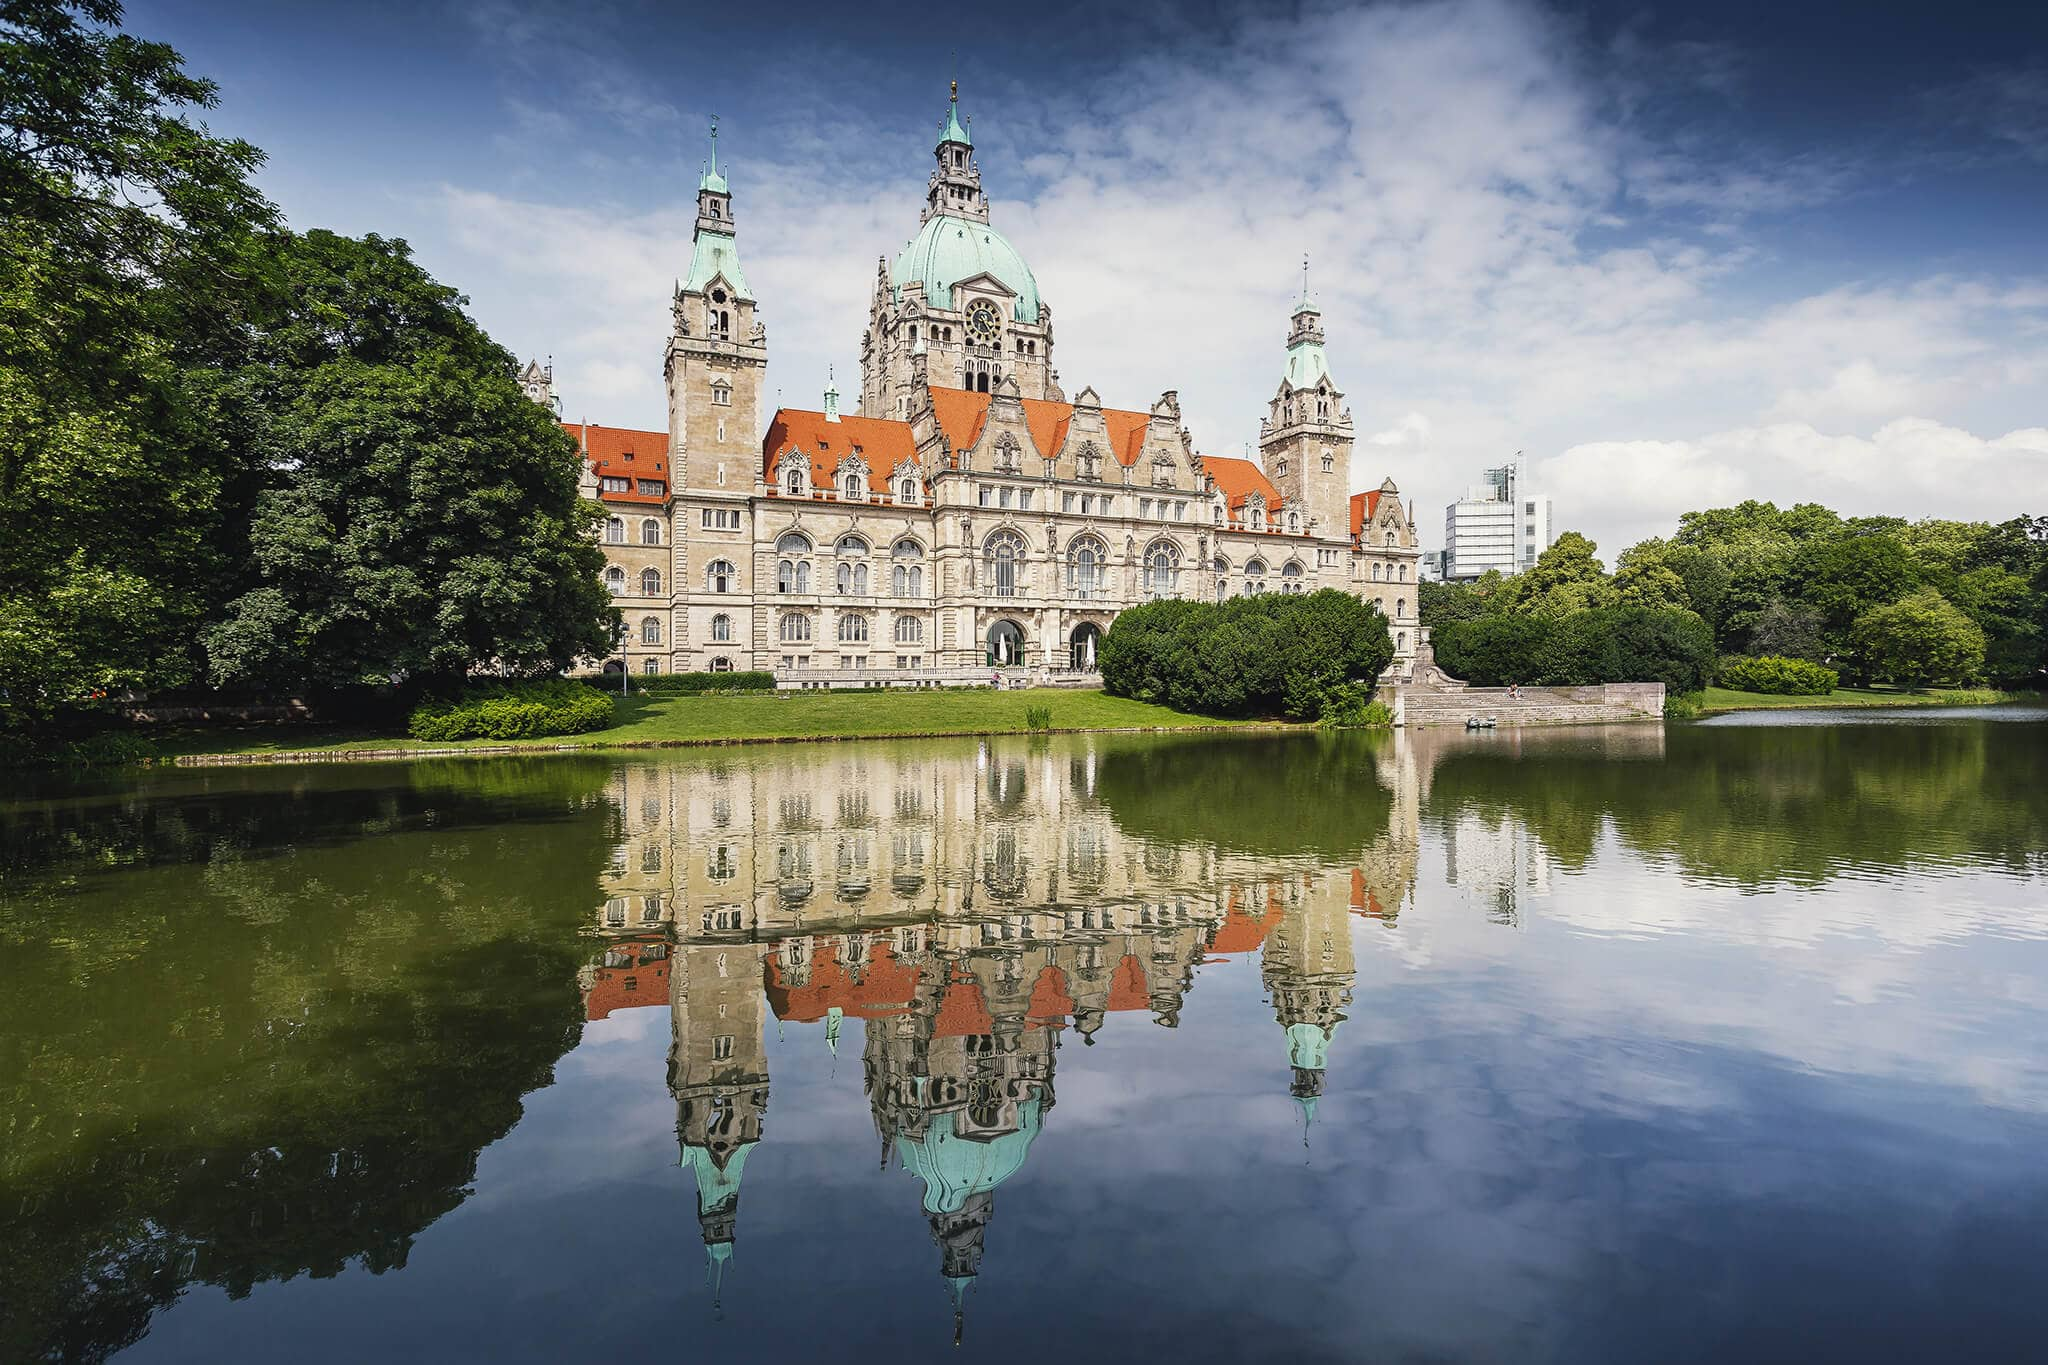 Neues Rathaus Hannover - Grüne Stadt Hannover